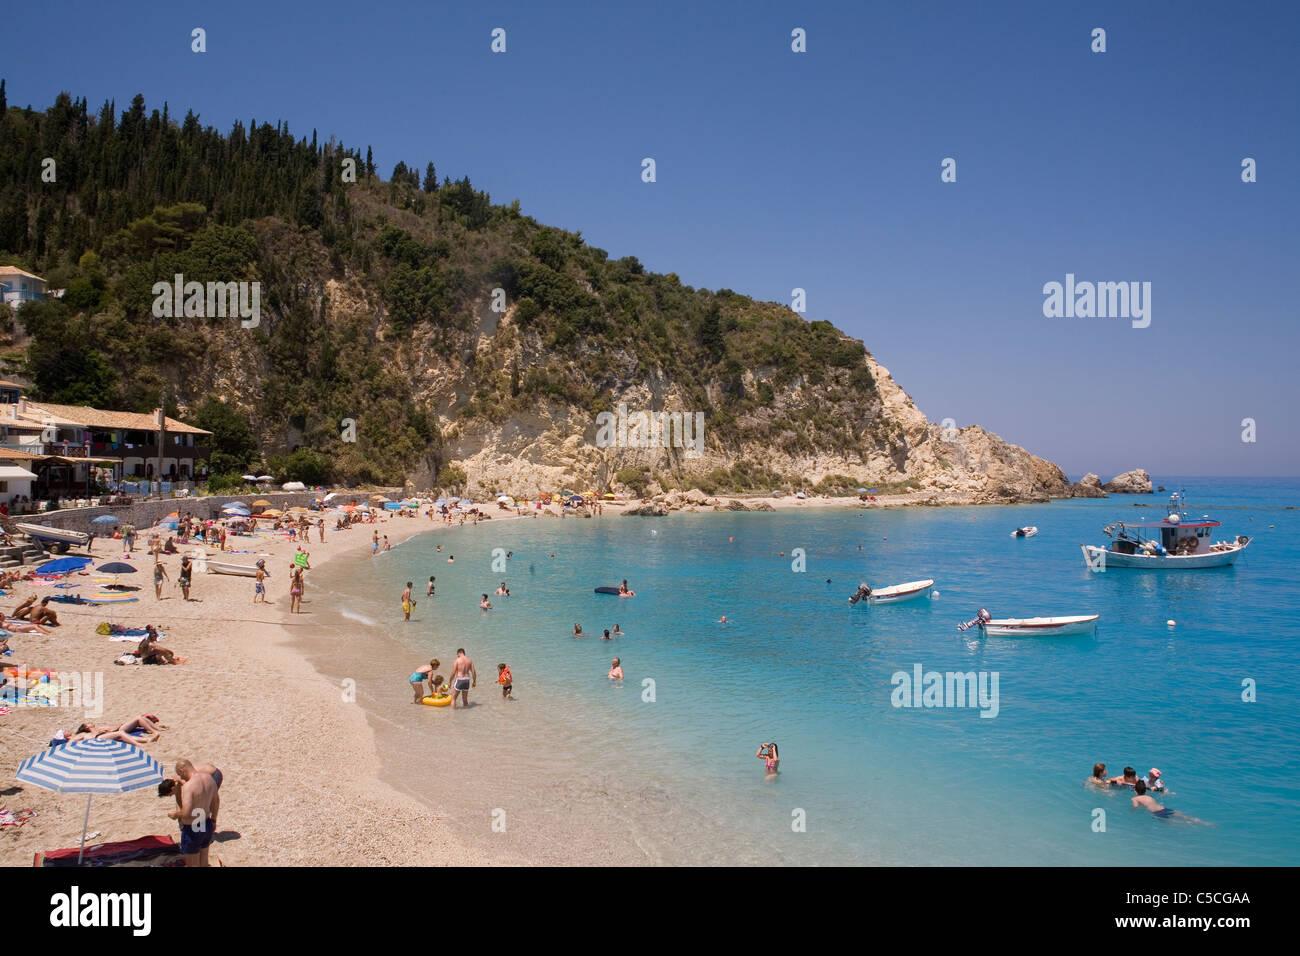 Greece Ionian islands Lefkada Aghios Nikitas Stock Photo